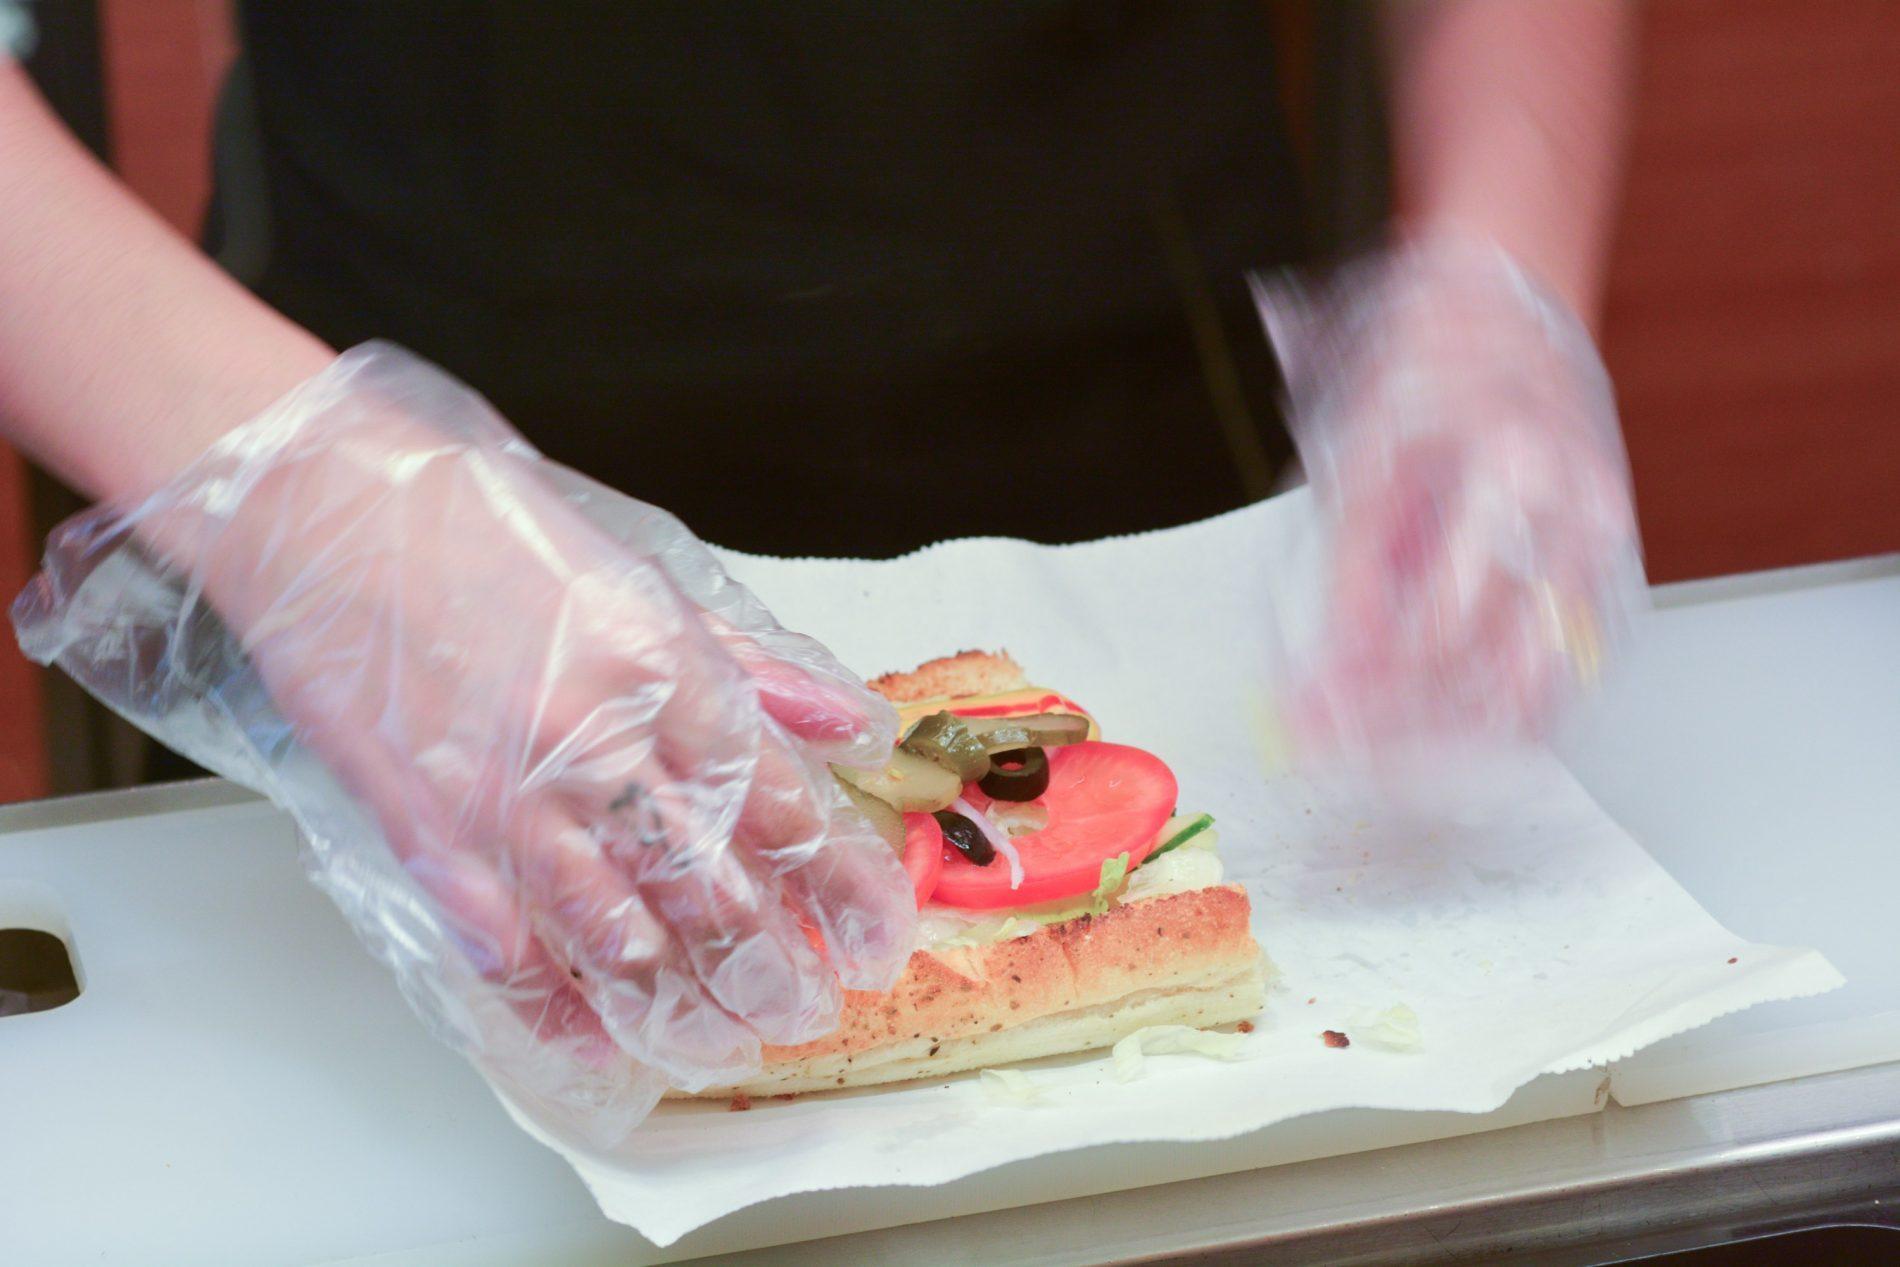 What's in your chicken sandwich? DNA test shows Subway sandwiches contain just 50% chicken